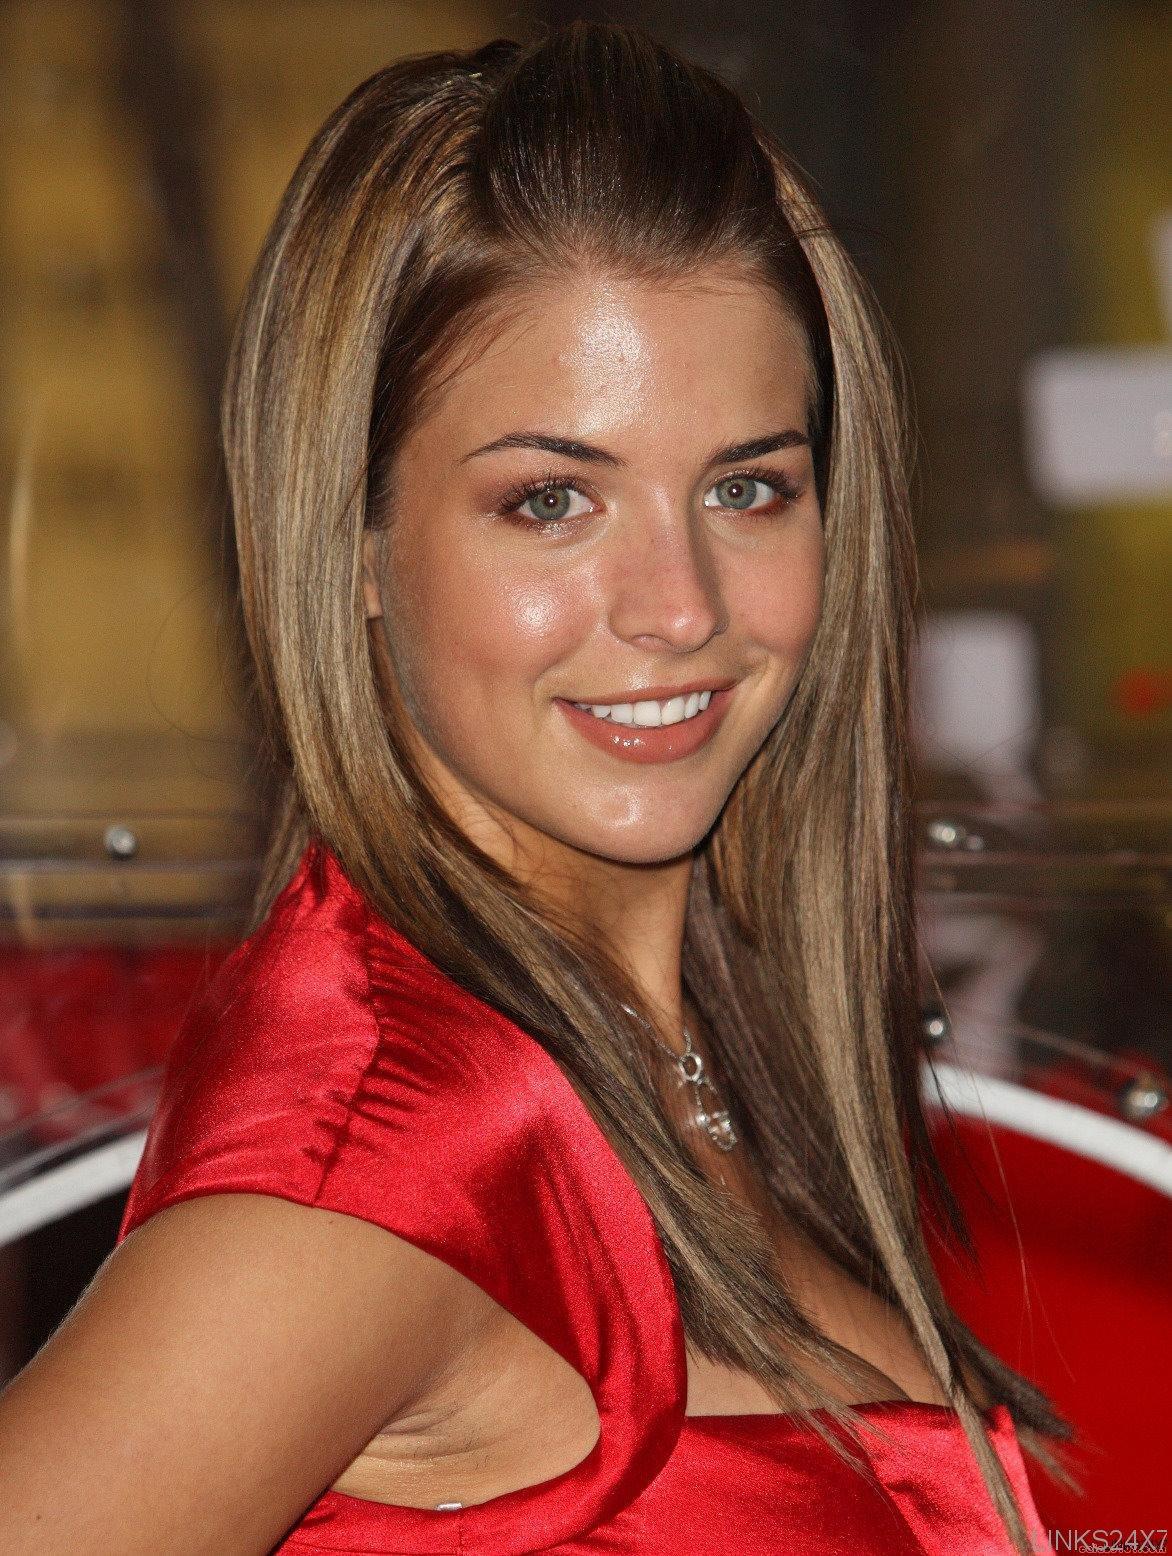 Abbie Cornish Hot Pics Gallery - Celebrity Picture